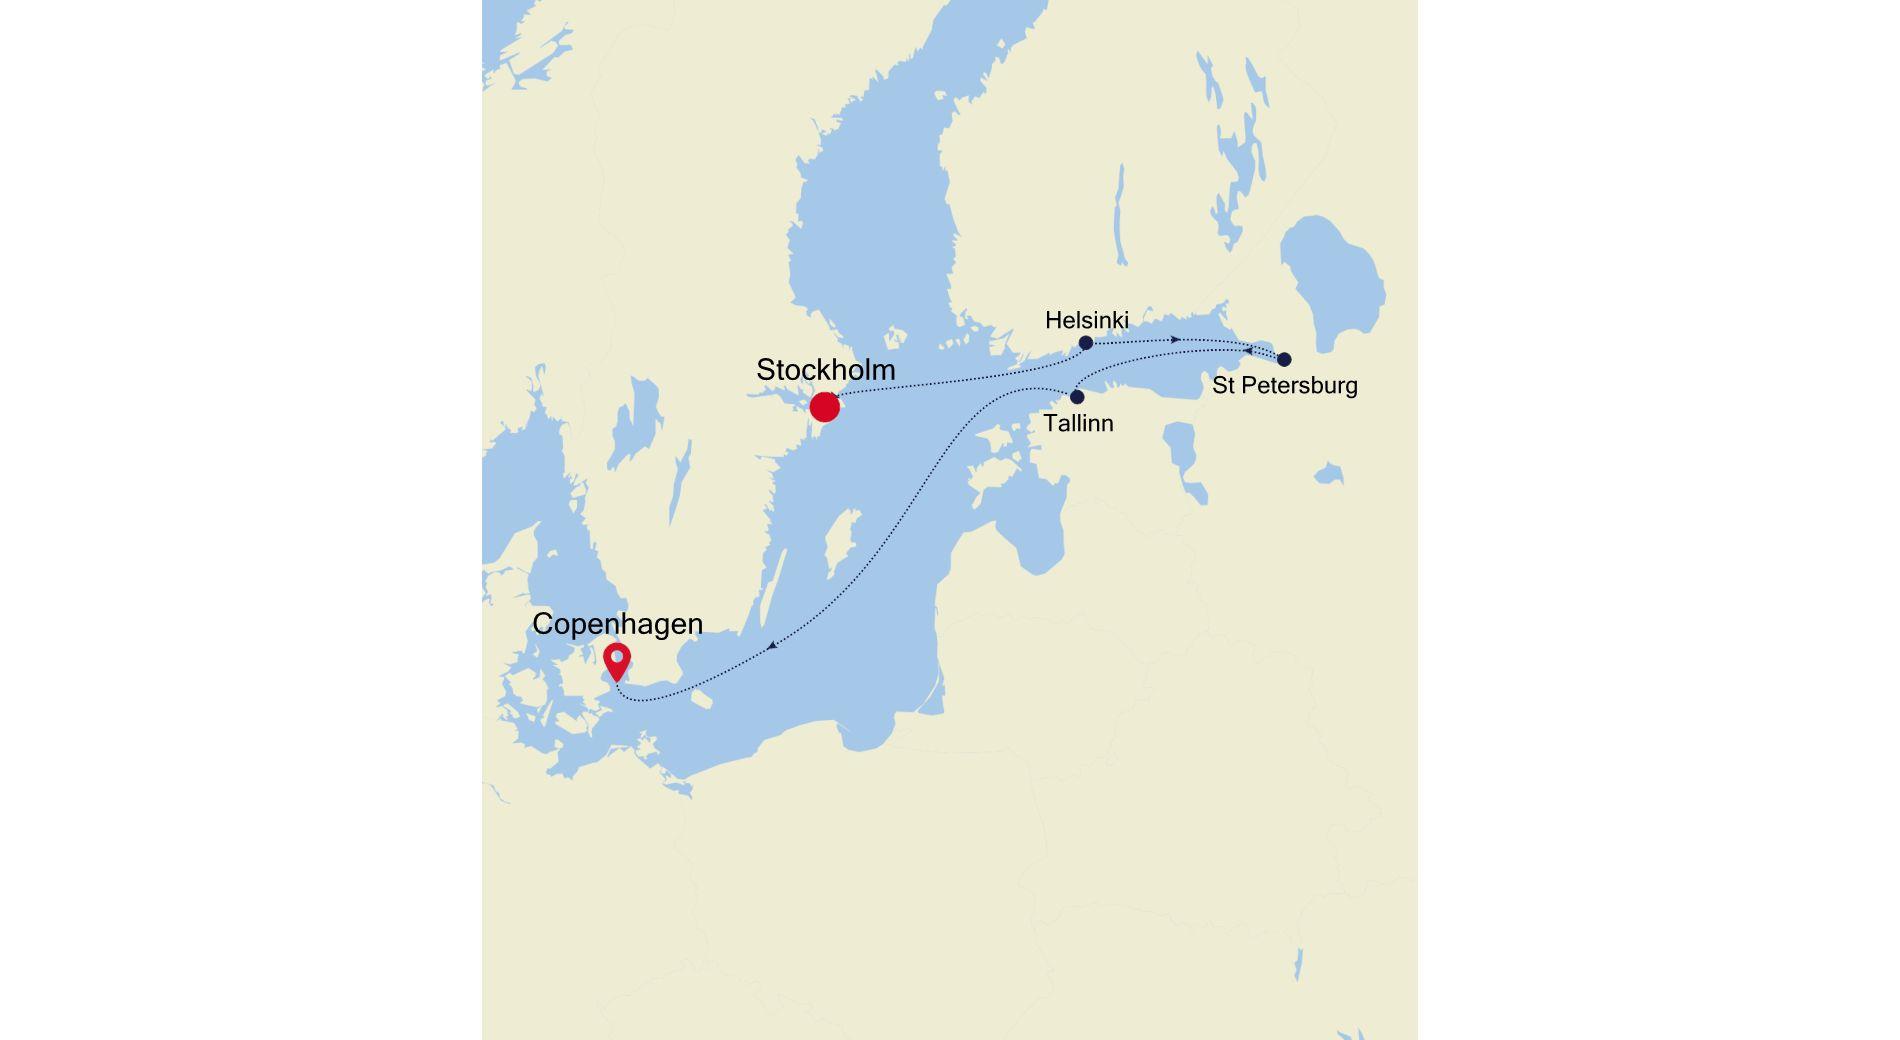 SL210723007 - Stockholm a Copenhagen